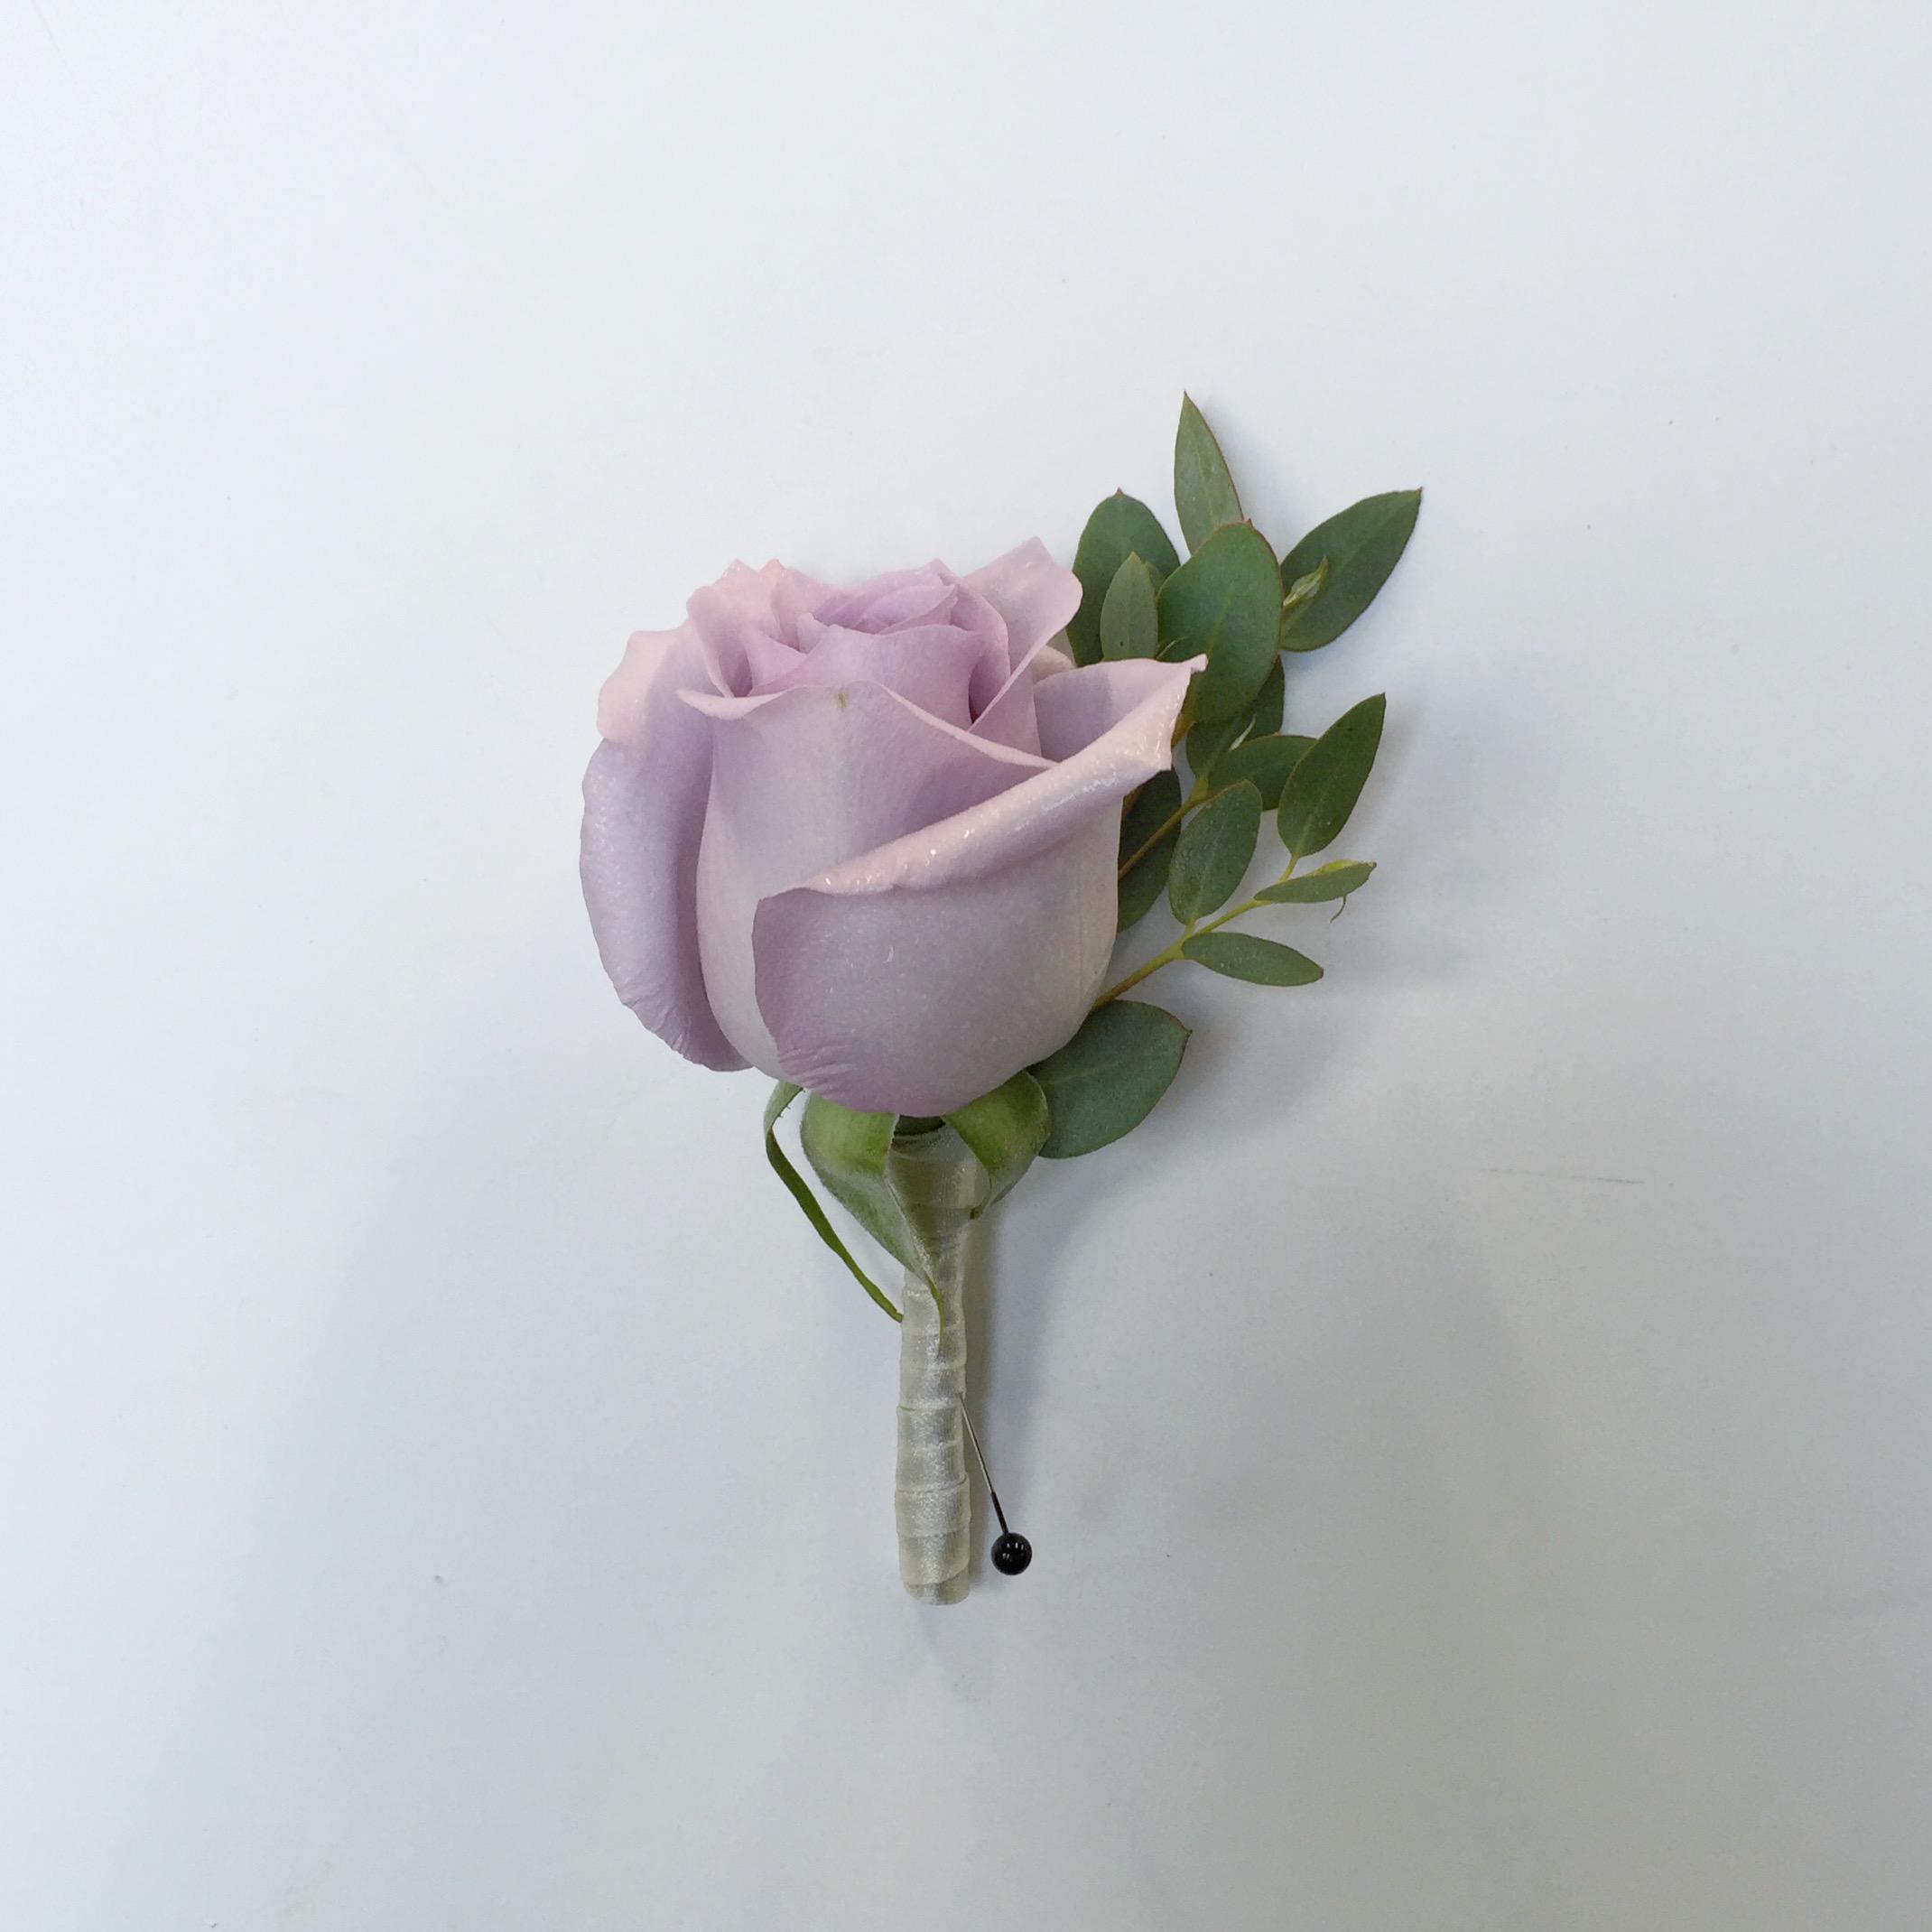 rose and lavender 247 followers, 221 following, 91 posts - see instagram photos and videos from atanaska djambazova (@rosenlavender).